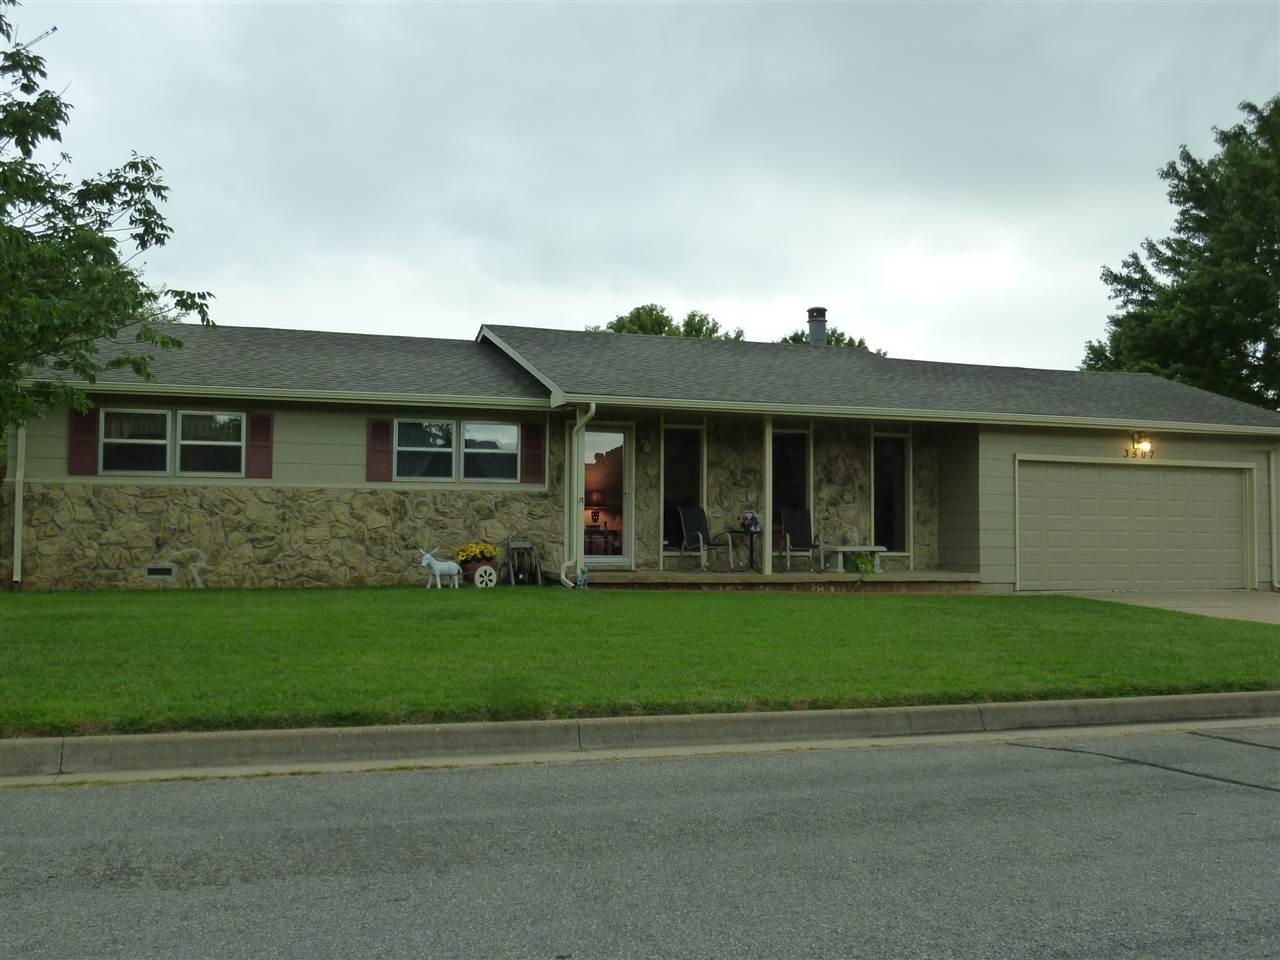 3507 W 32nd St. S., Wichita, KS 67217